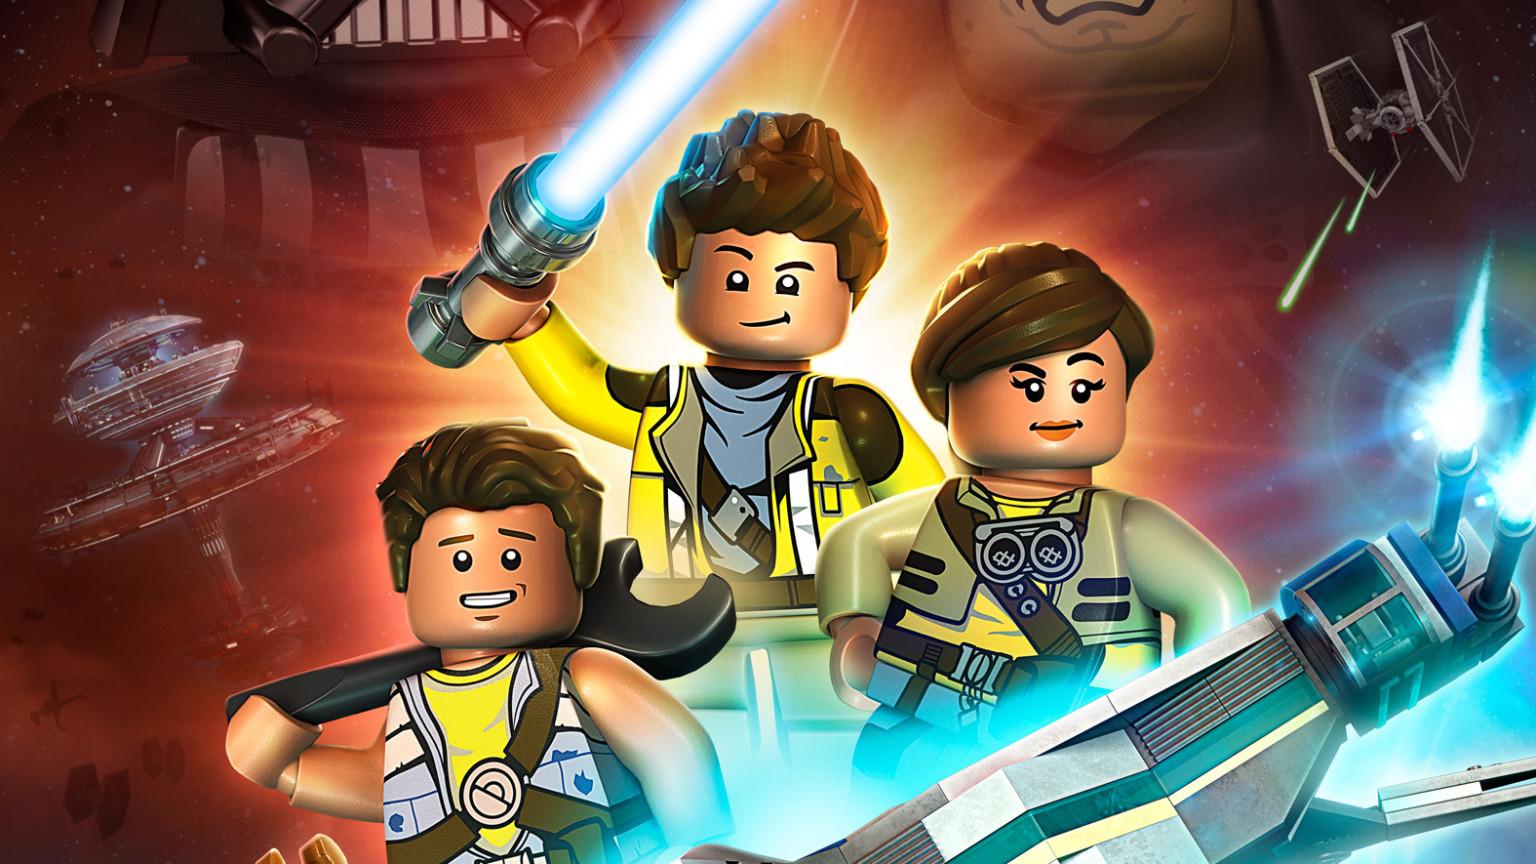 LEGO Star Wars: The Freemkaker Adventures